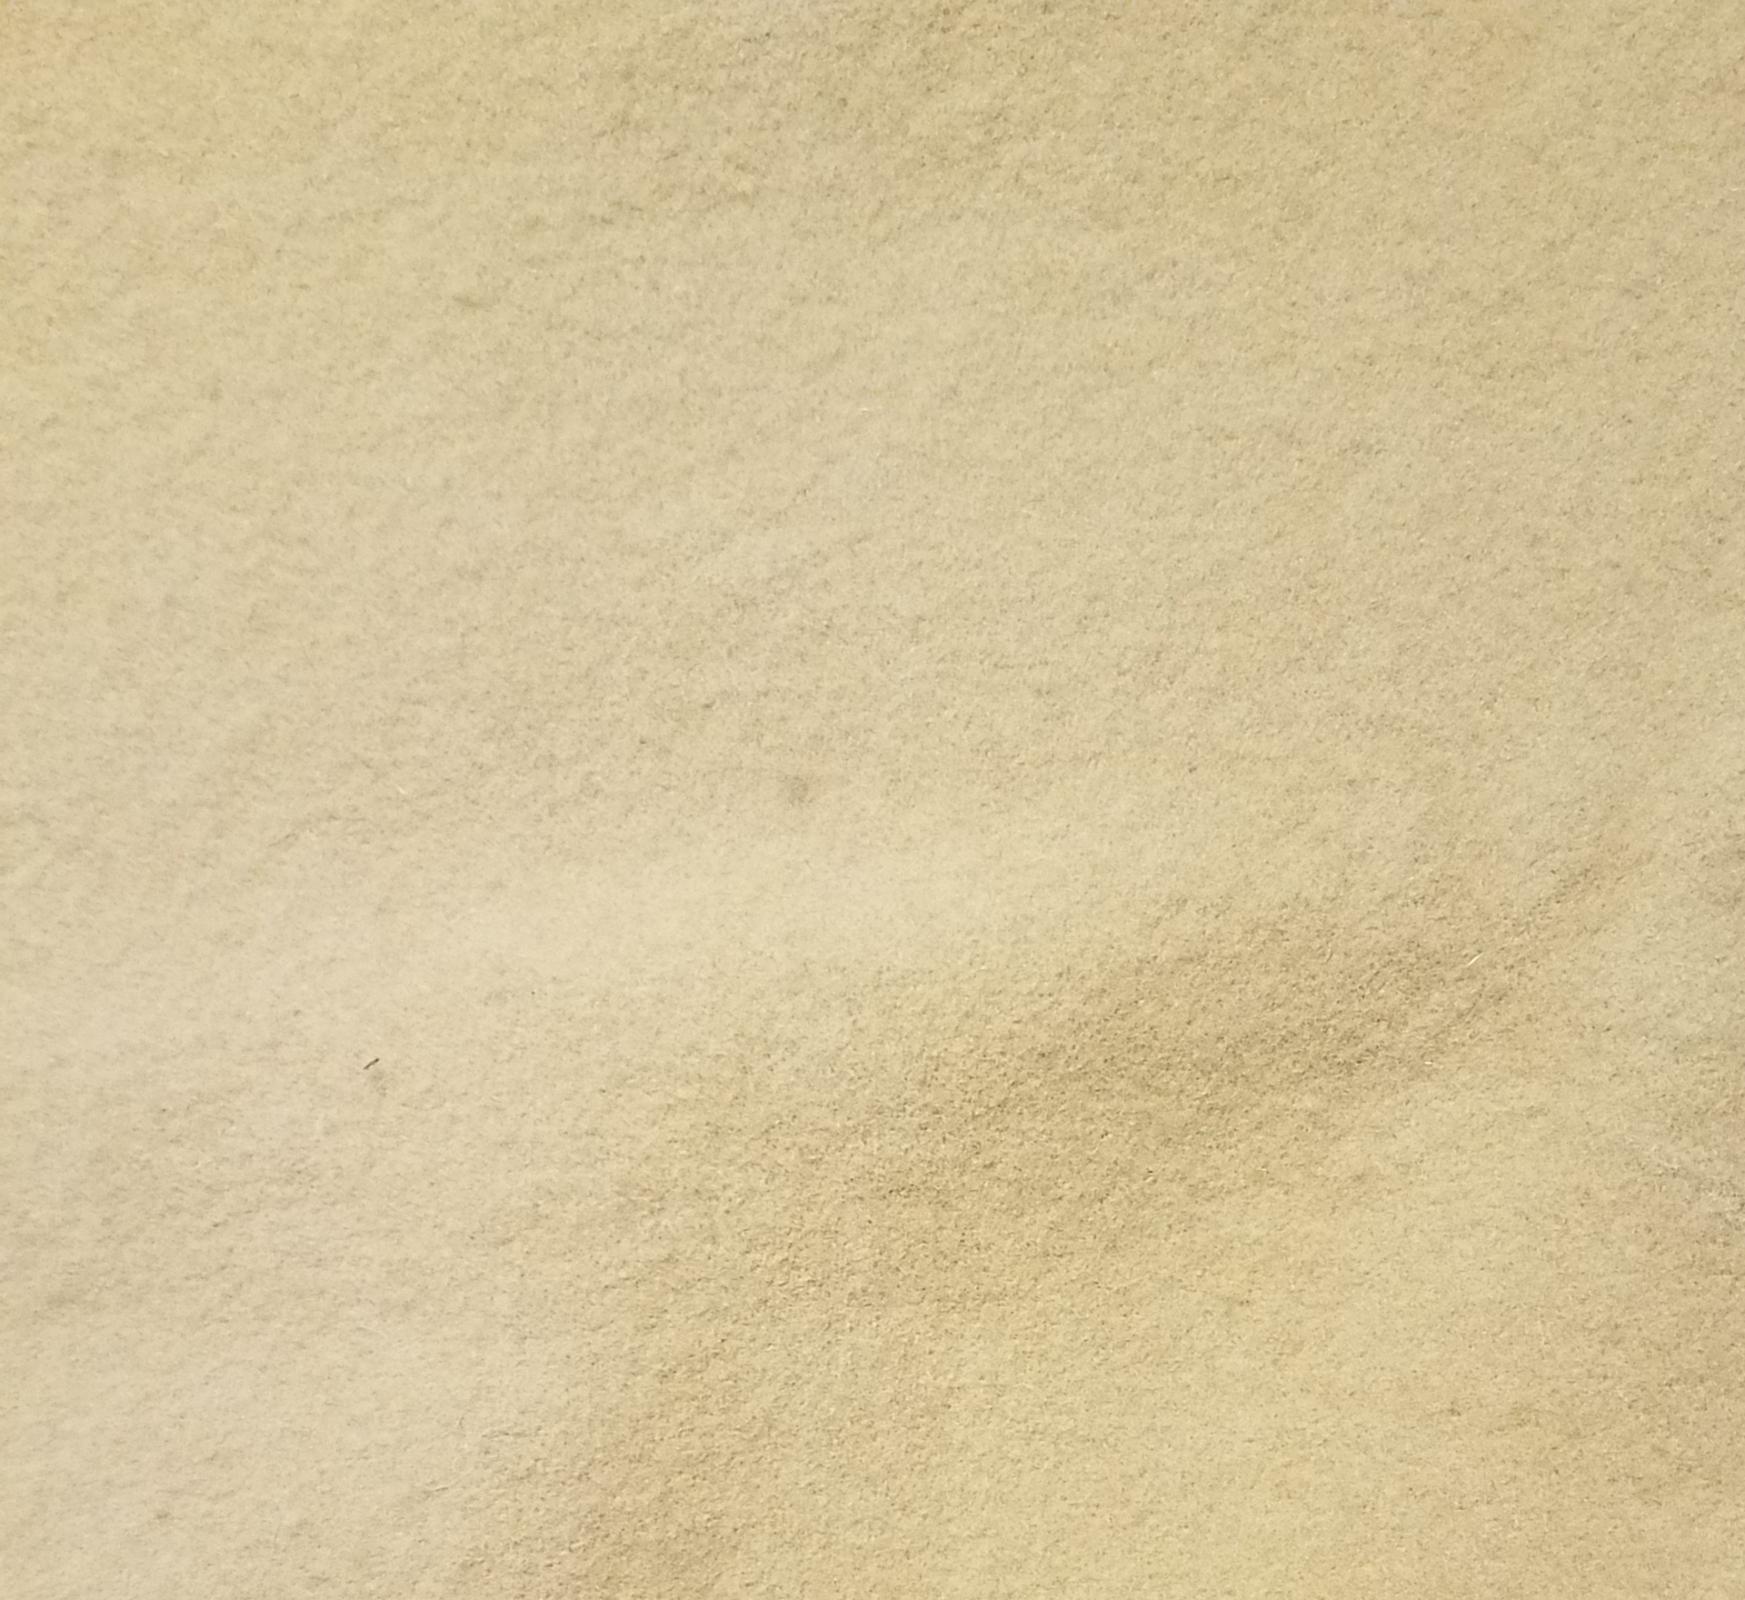 15 x 18 Piece of Heavy Weight Tan Wool